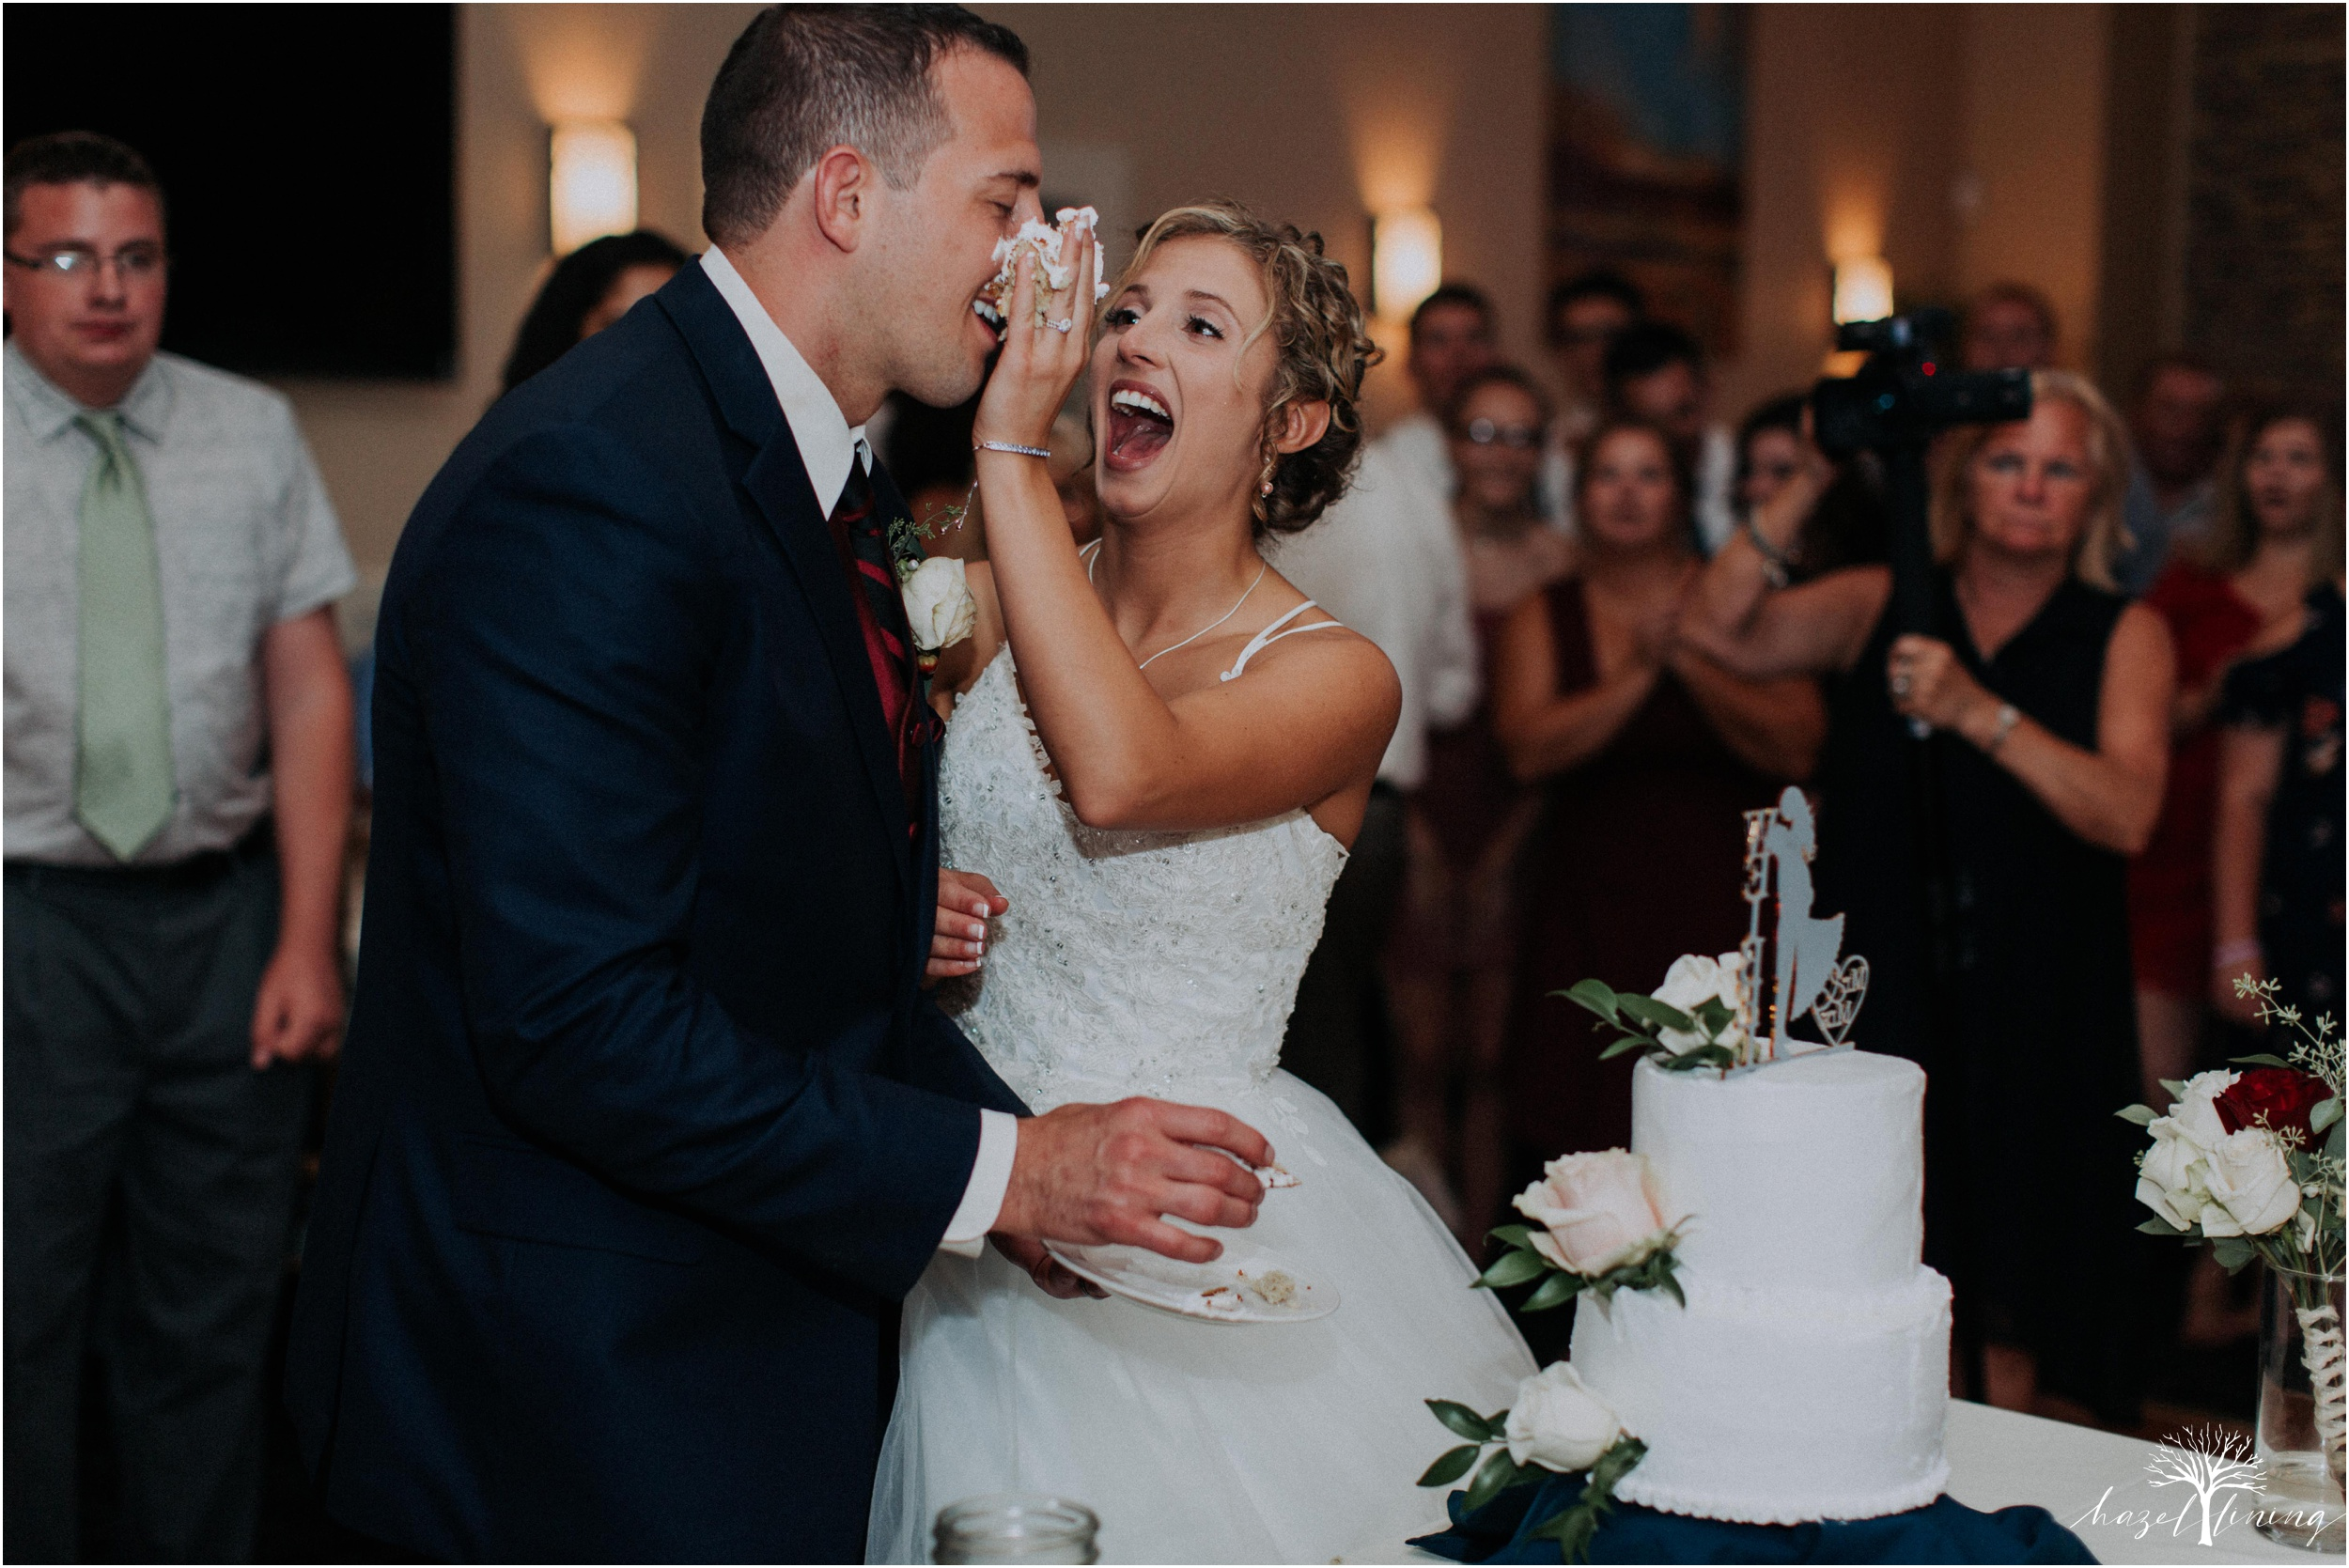 jonathan-weibel-becky-haywood-loft-at-sweetwater-cc-pennsburg-pennsylvania-rainy-day-summer-wedding-hazel-lining-travel-wedding-elopement-photography_0128.jpg